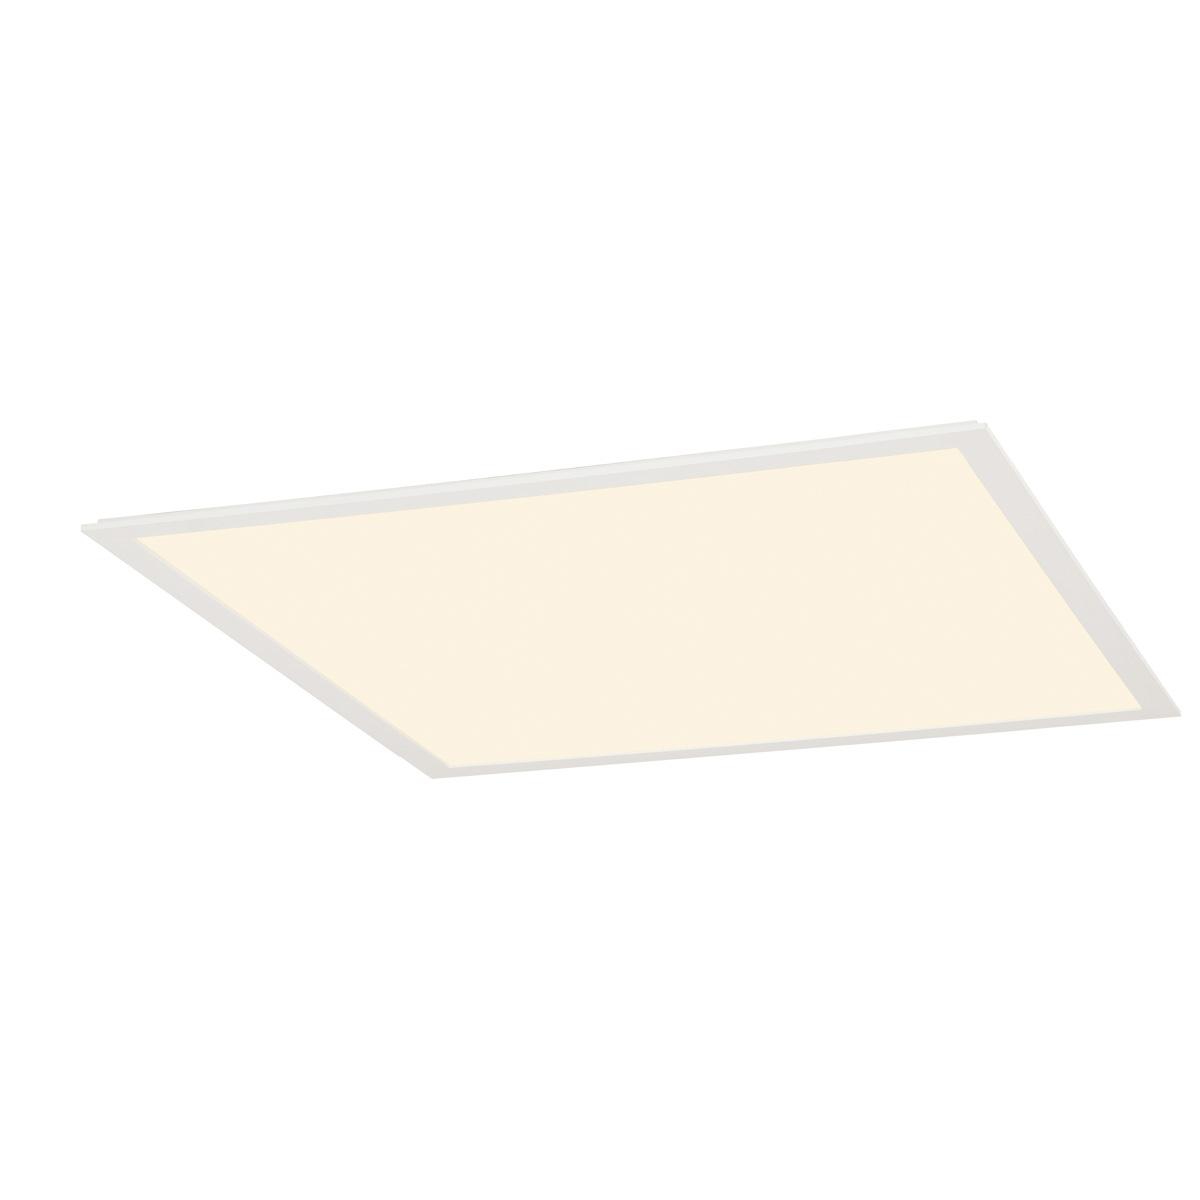 slv led panel f r rasterdecken weiss 230v 3000k 620x620mm g nstig online kaufen. Black Bedroom Furniture Sets. Home Design Ideas